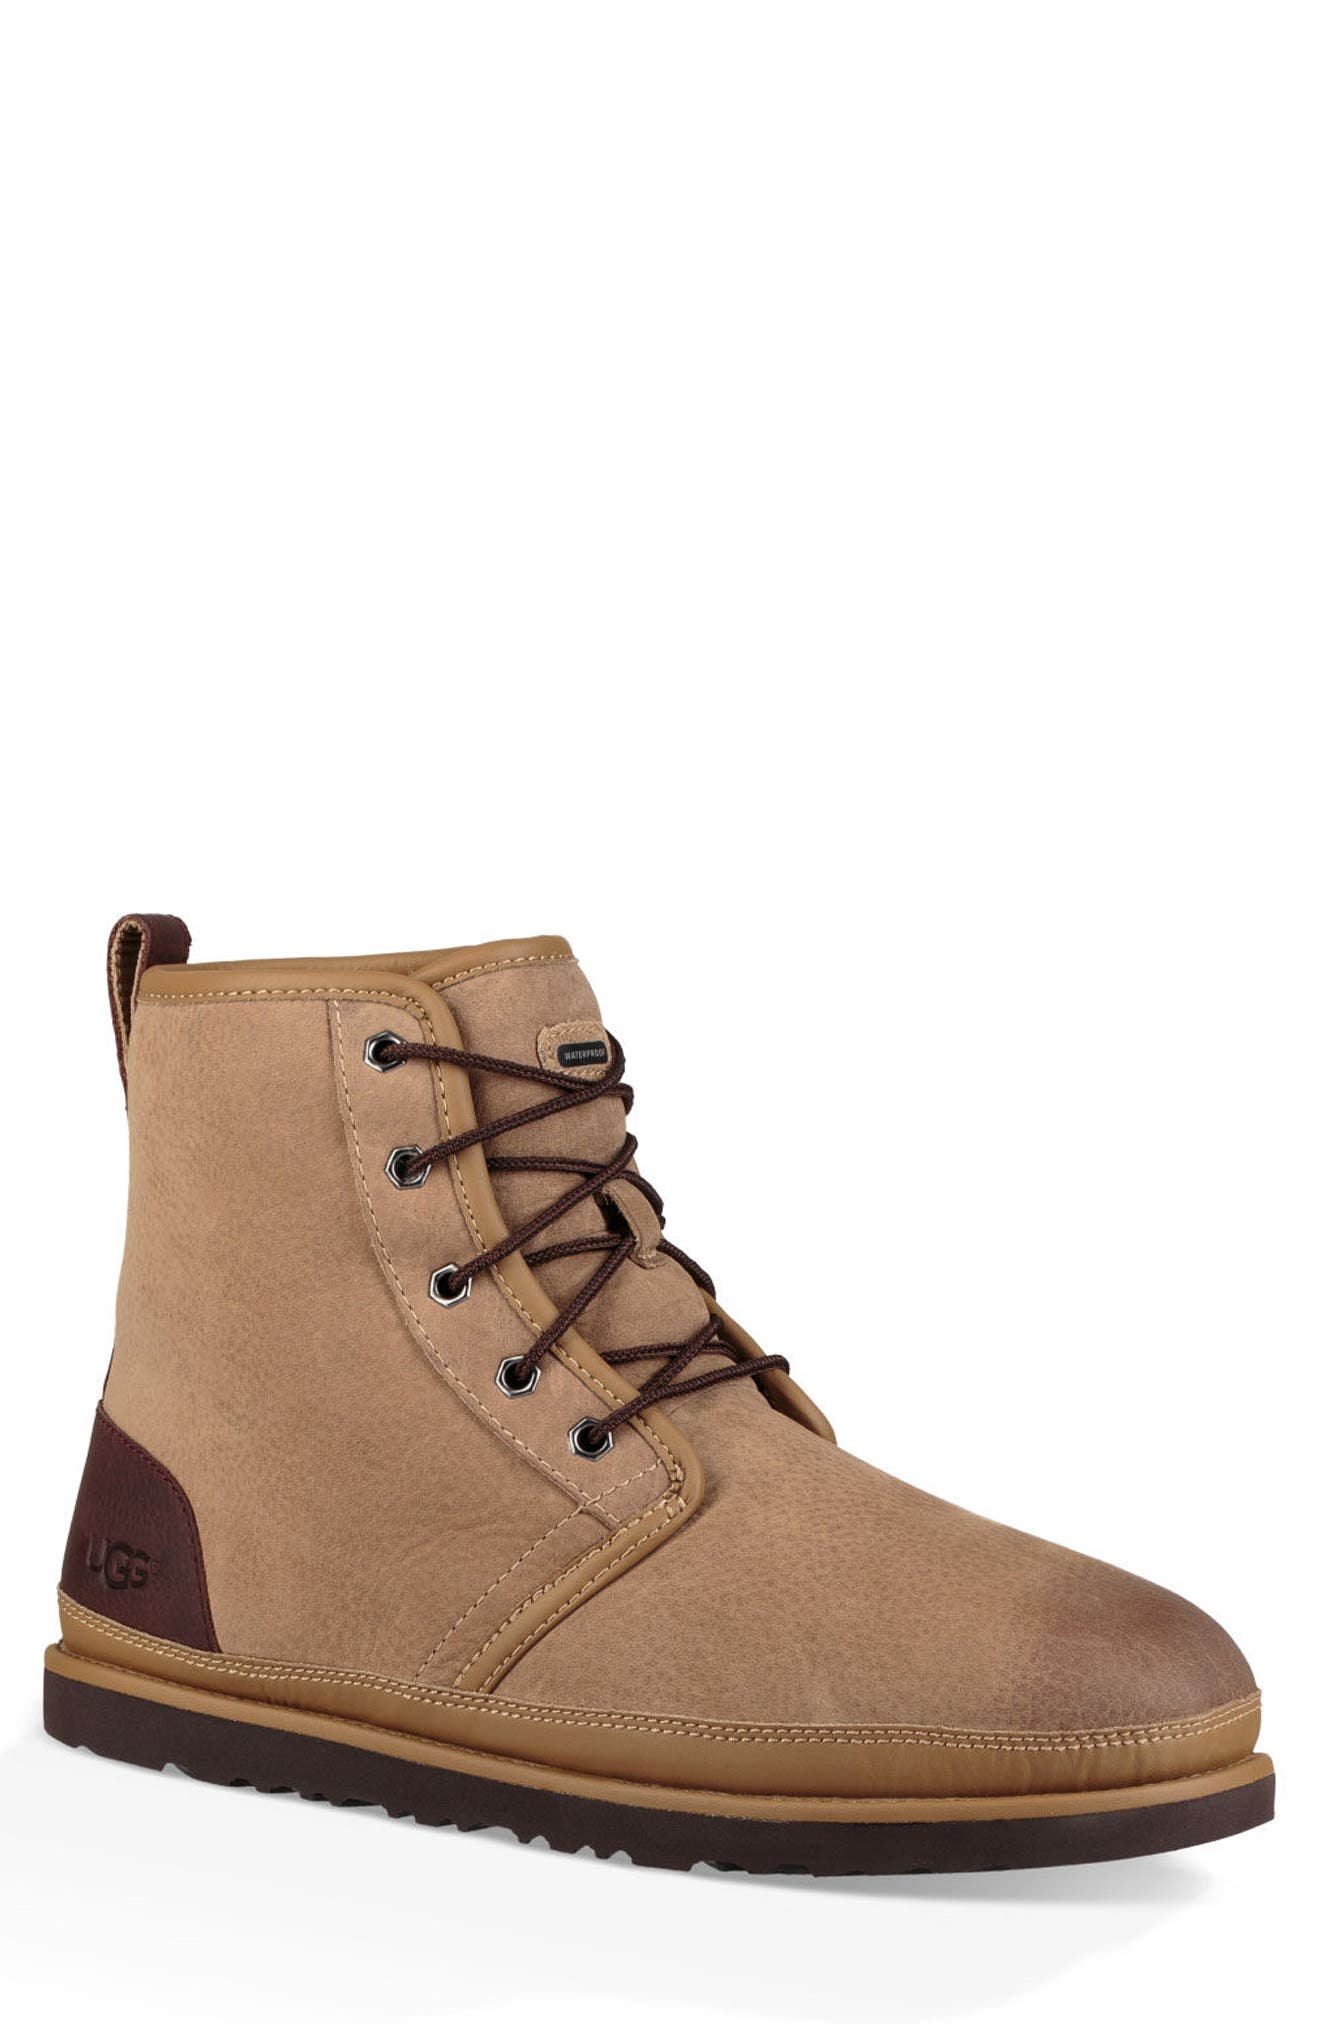 Harkley Waterproof Lace-Up Boot,                         Main,                         color, DESERT TAN